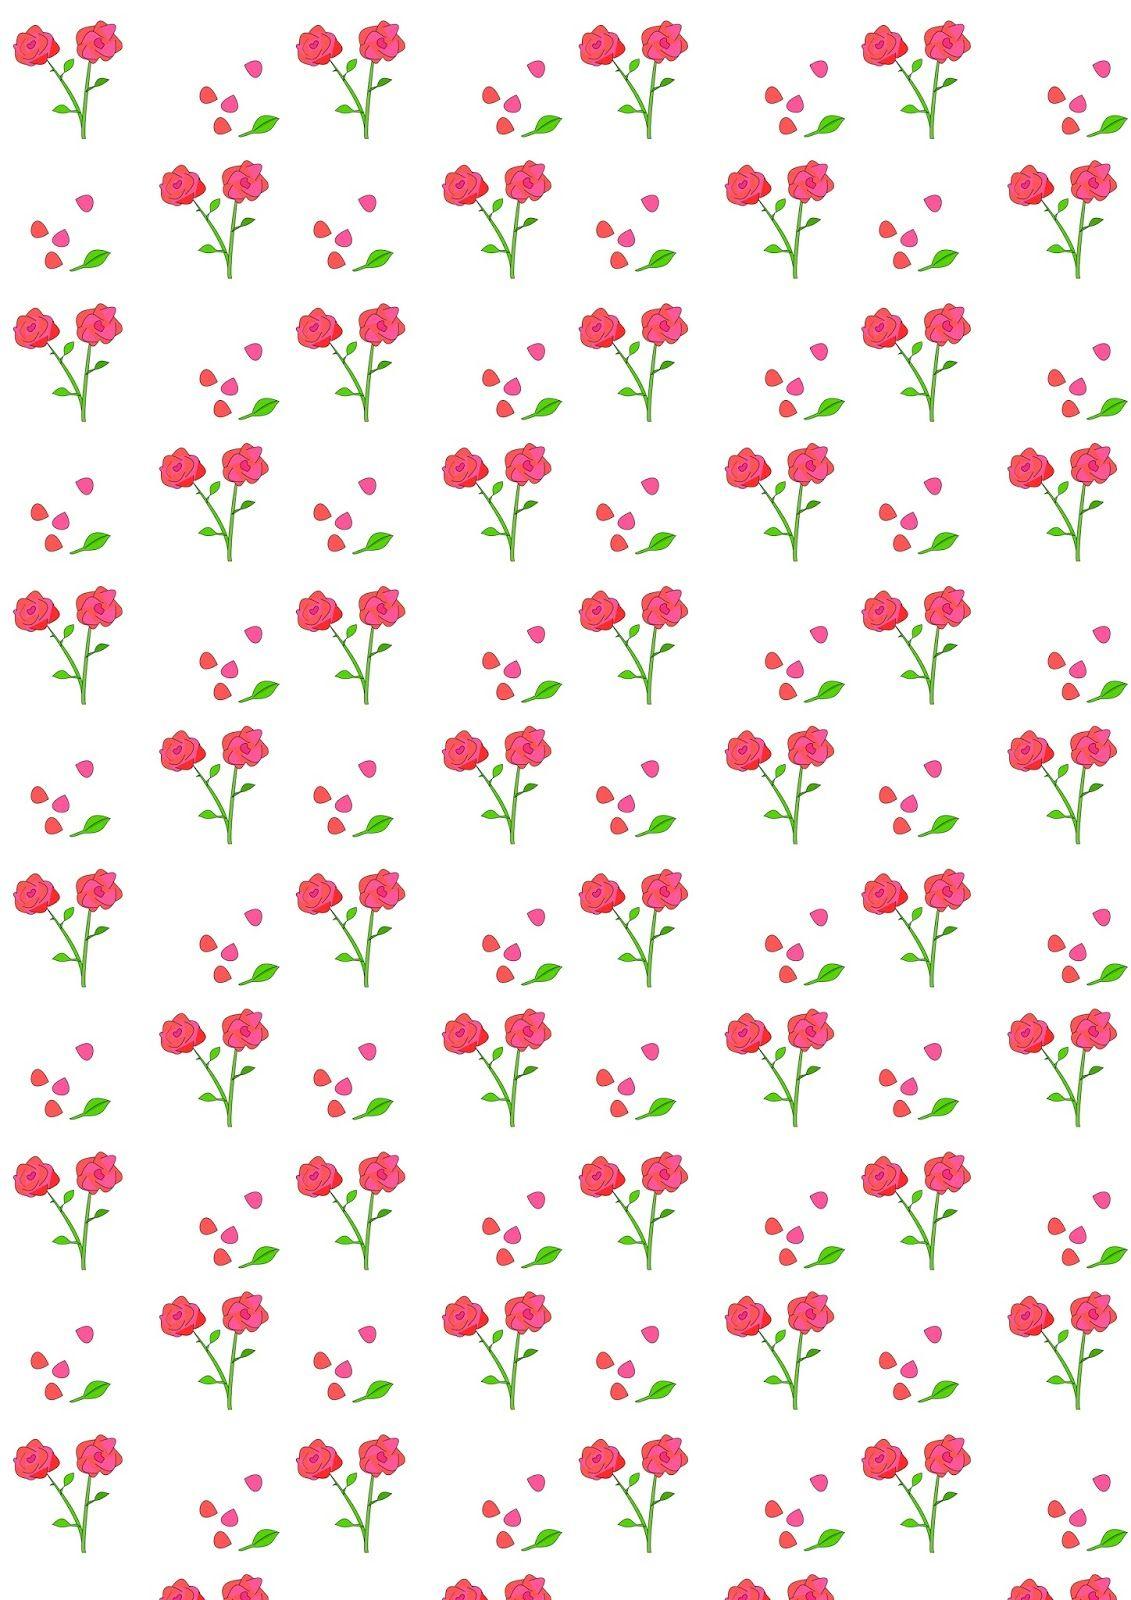 Free Digital Rose Scrapbooking Paper - Ausdruckbares Geschenkpapier - Free Printable Scrapbook Paper Designs